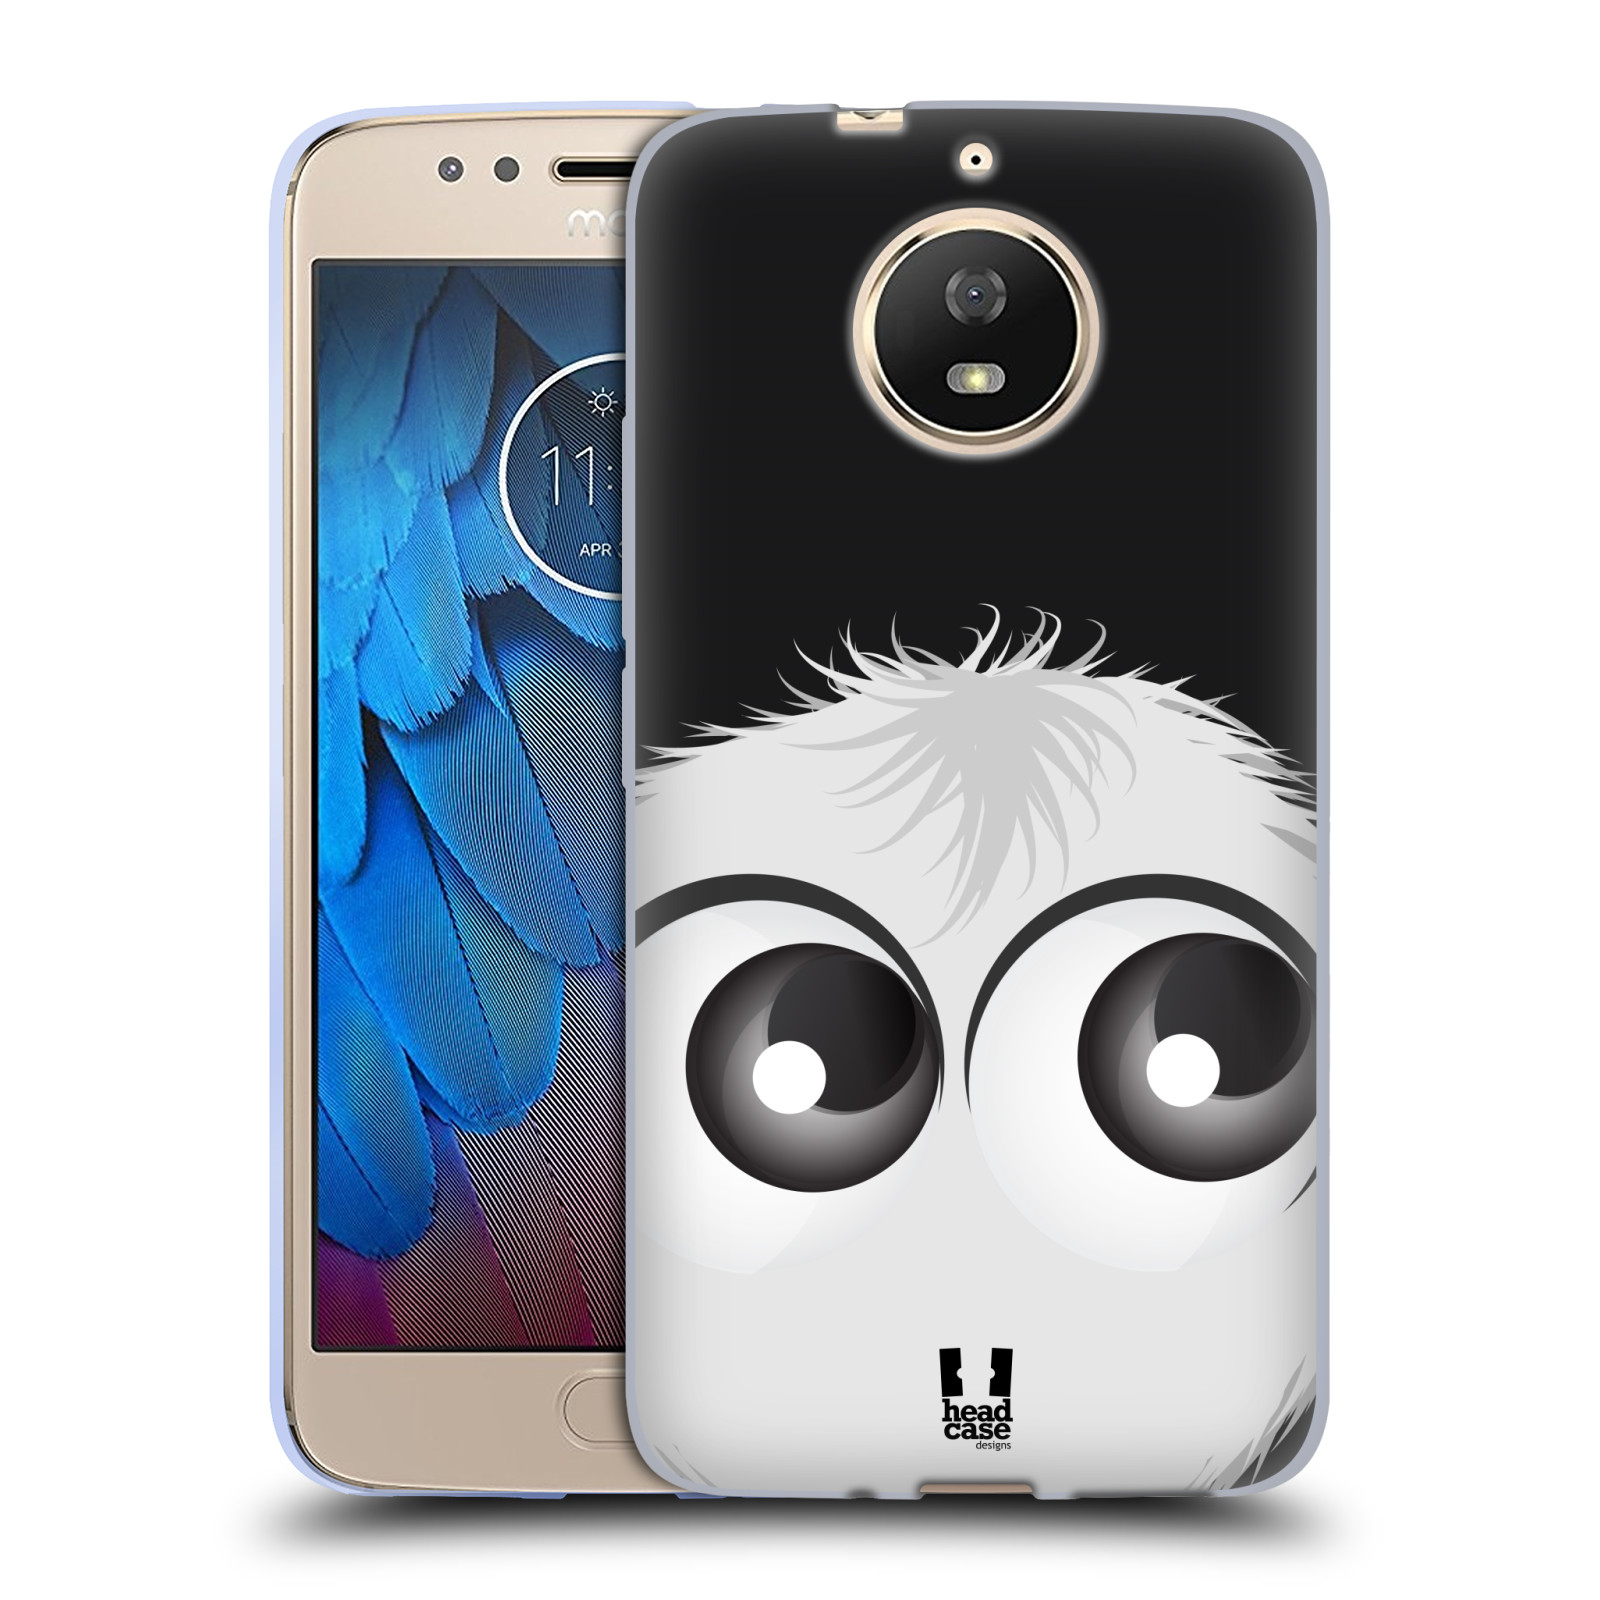 Silikonové pouzdro na mobil Lenovo Moto G5s - Head Case - FUZÍK BÍLÝ (Silikonový kryt či obal na mobilní telefon (Motorola) Lenovo Moto G5s s motivem FUZÍK BÍLÝ)